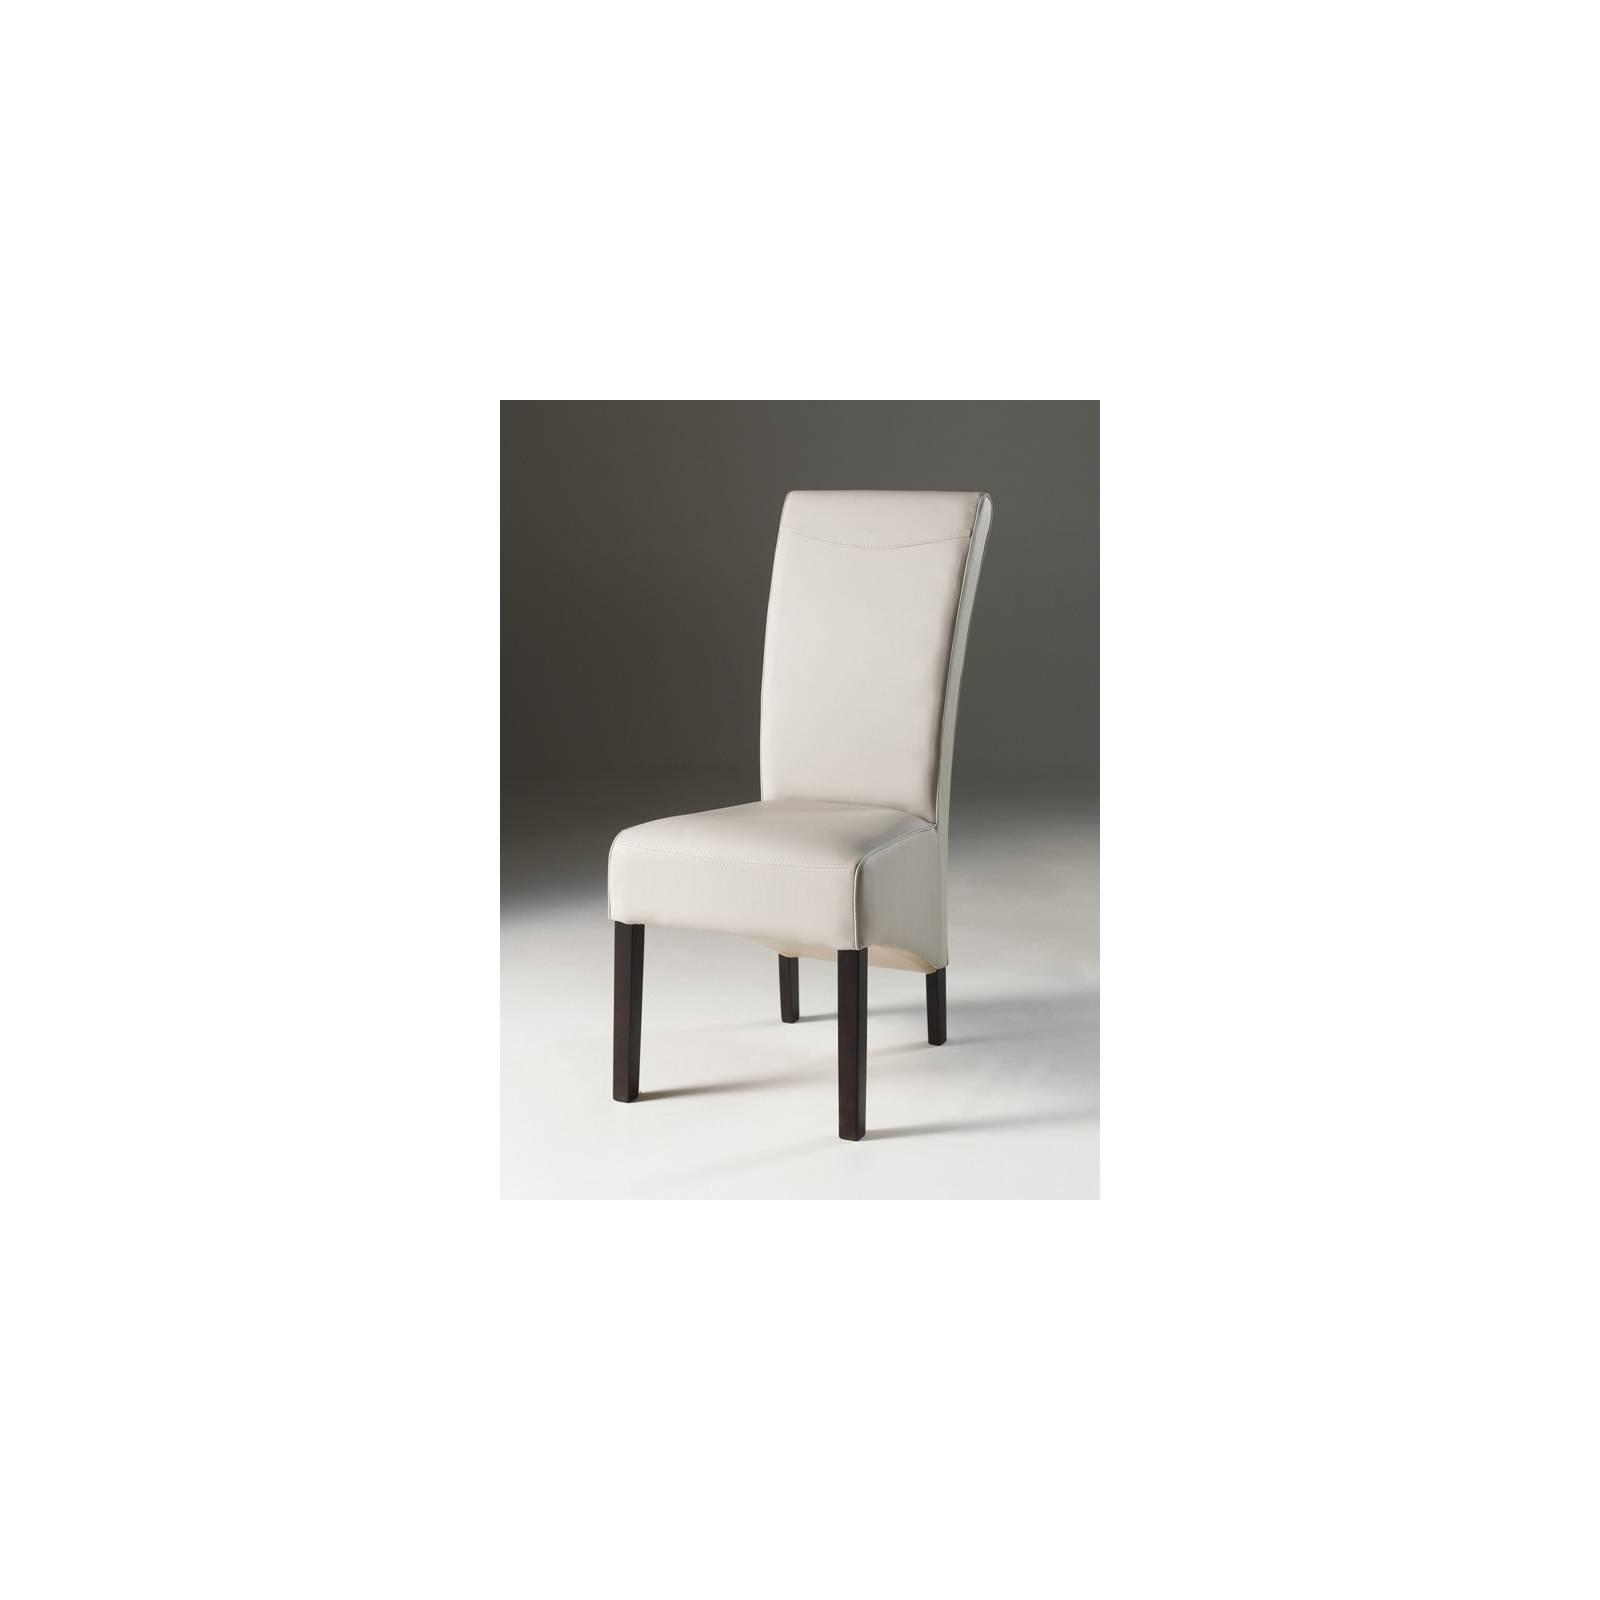 Chaise Maxima Bycast - meuble style classique